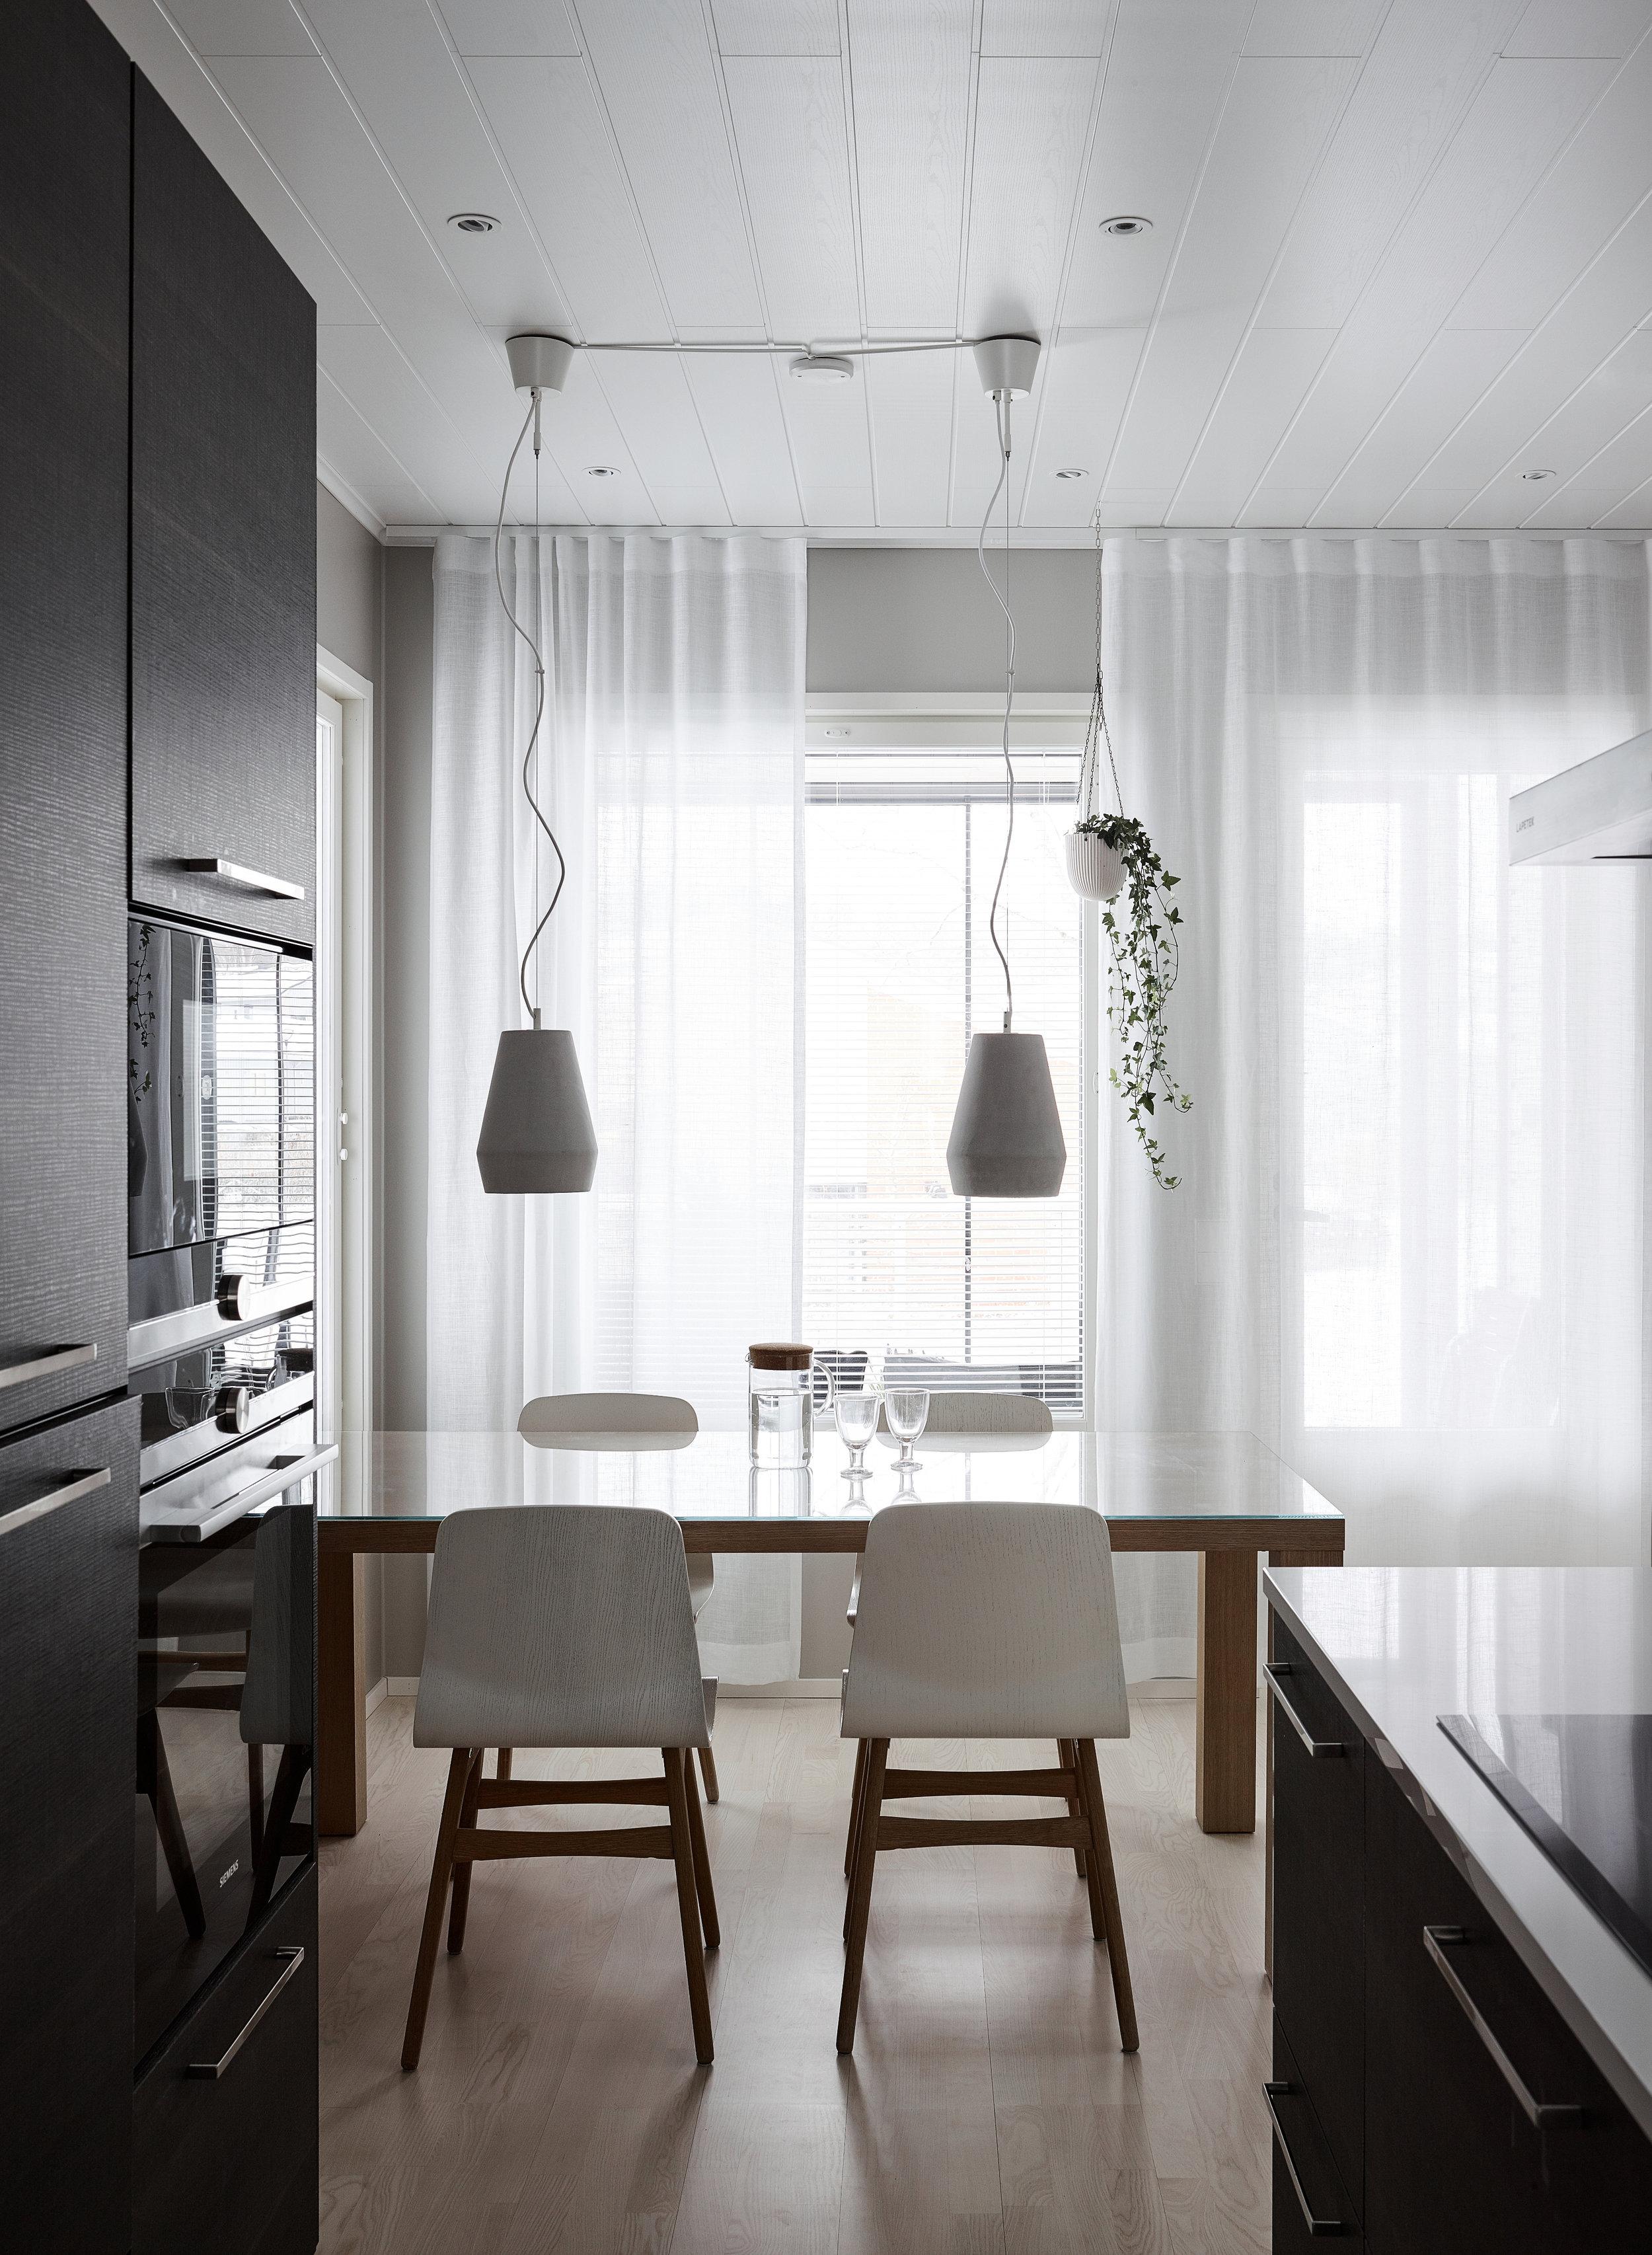 interior-anna-koponen-photo-krista-keltanen-06.jpg